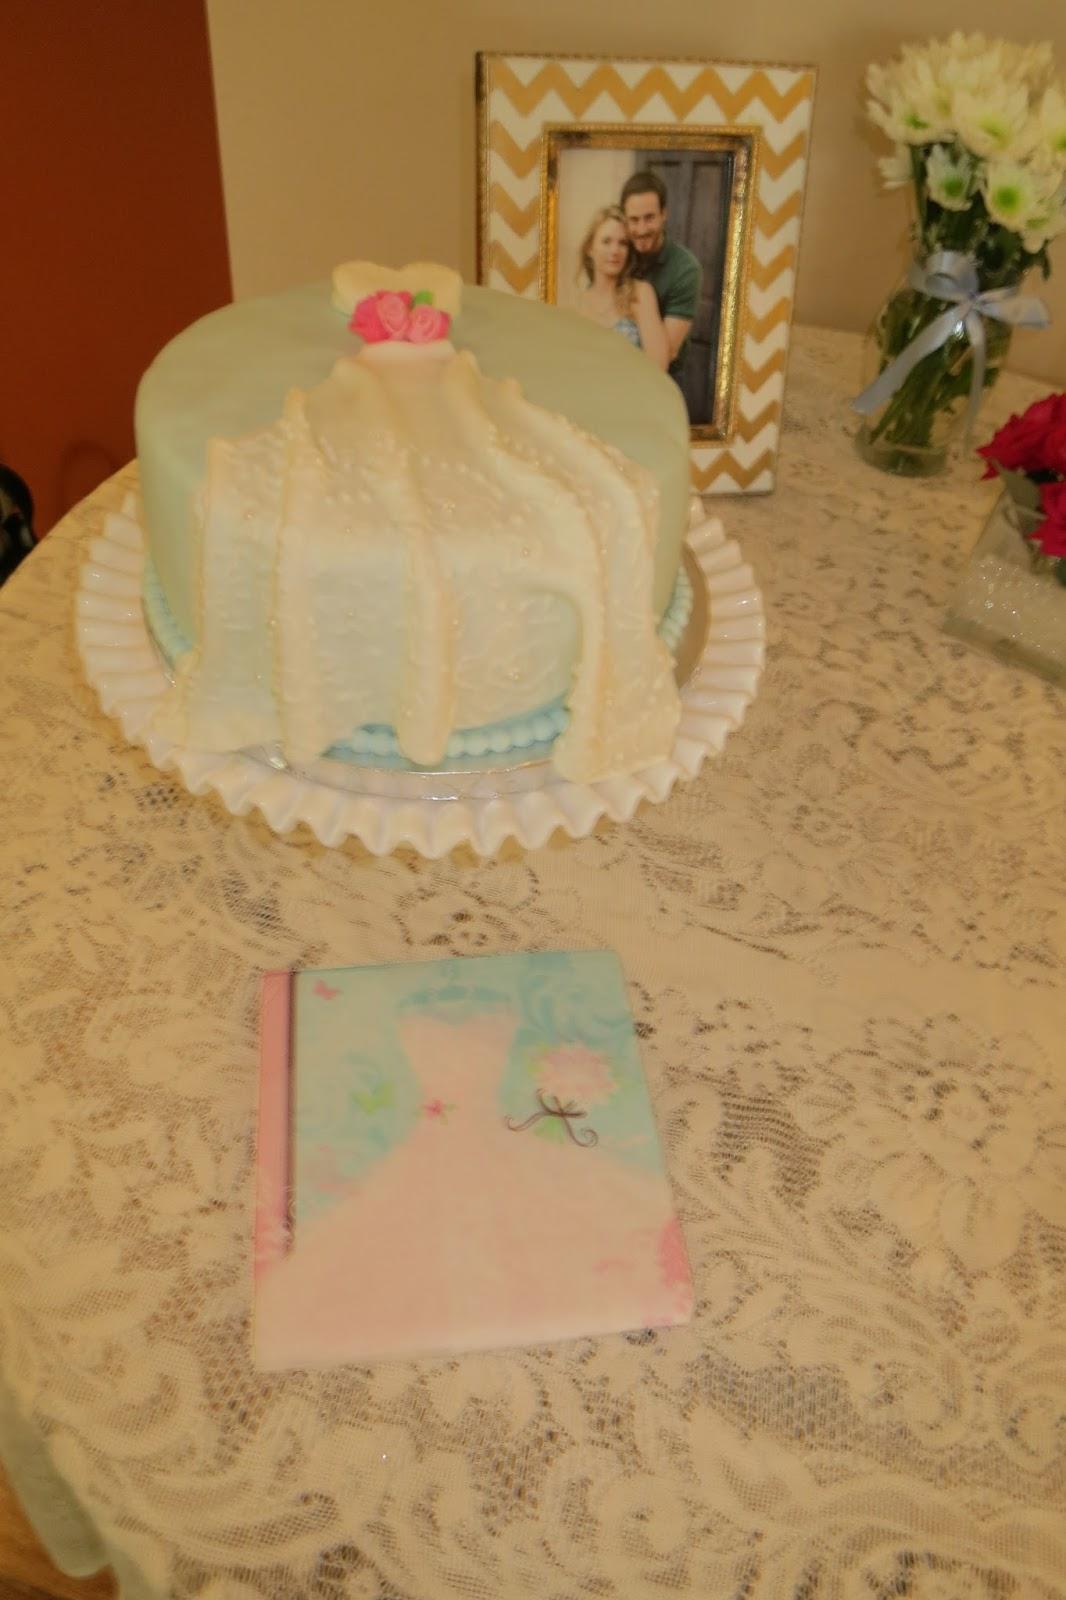 Fifty Shades of Cakes: Wedding Dress Bridal Shower Cake